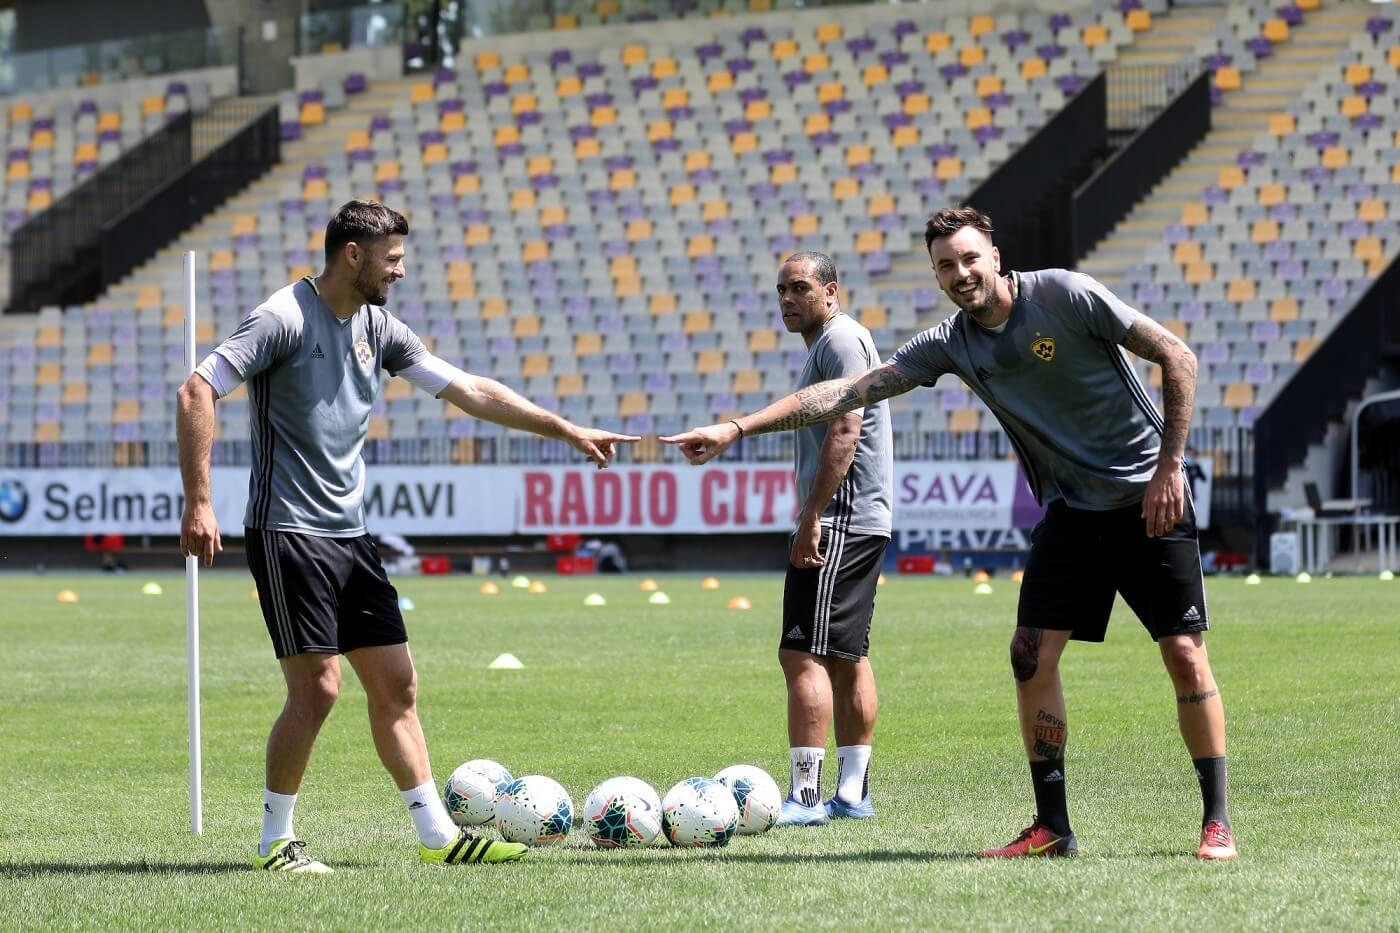 Prvi trening NK Maribora po koronavirusu | Net TV online